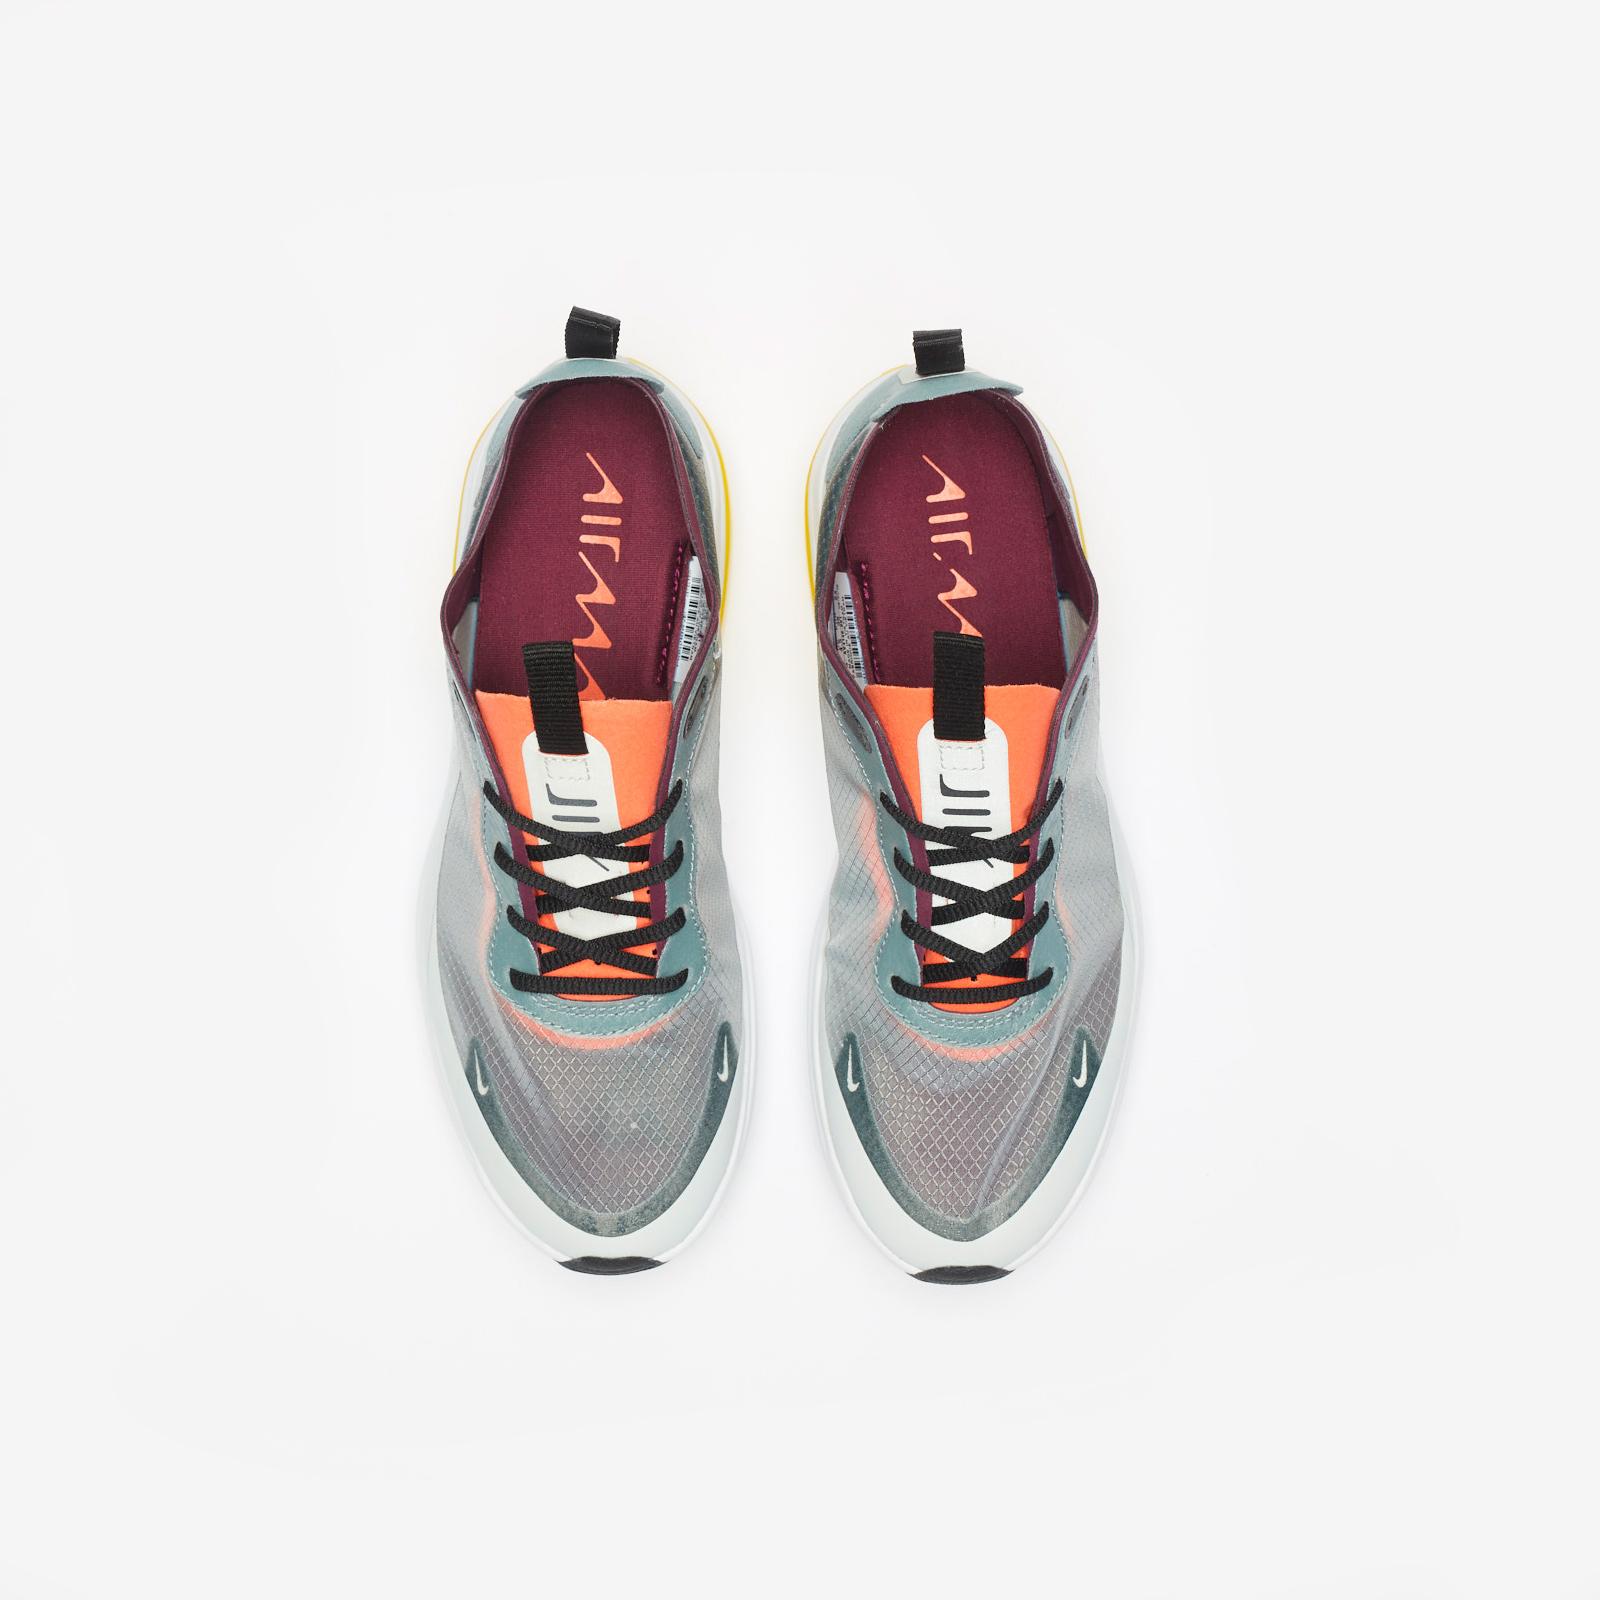 Nike Wmns Air Max Dia SE QS Av4146 001 Sneakersnstuff